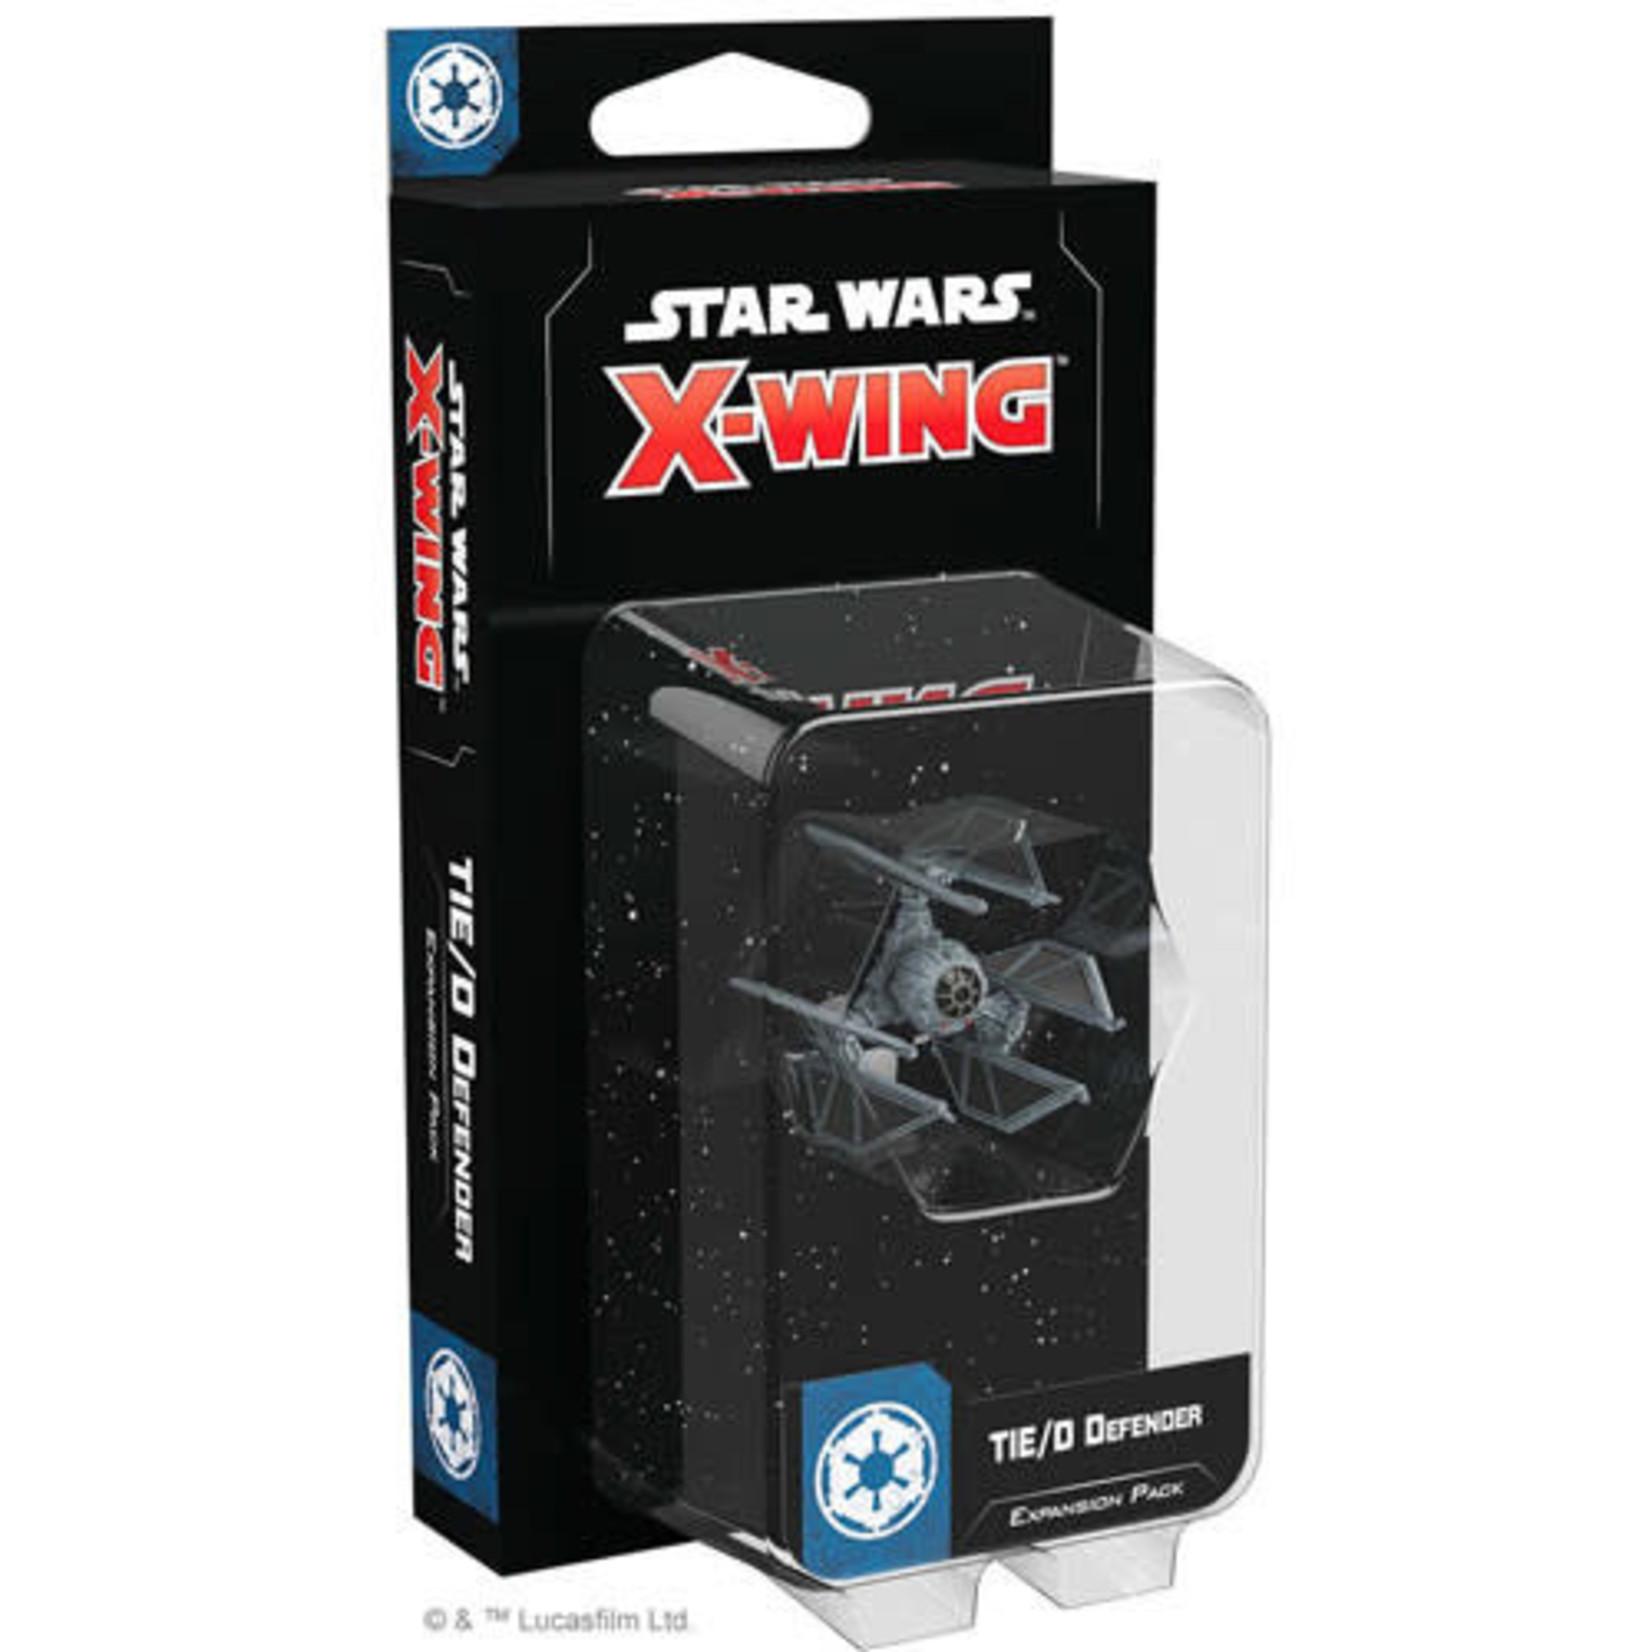 Star Wars X-Wing 2e: TIE/D Defender Expansion Pack